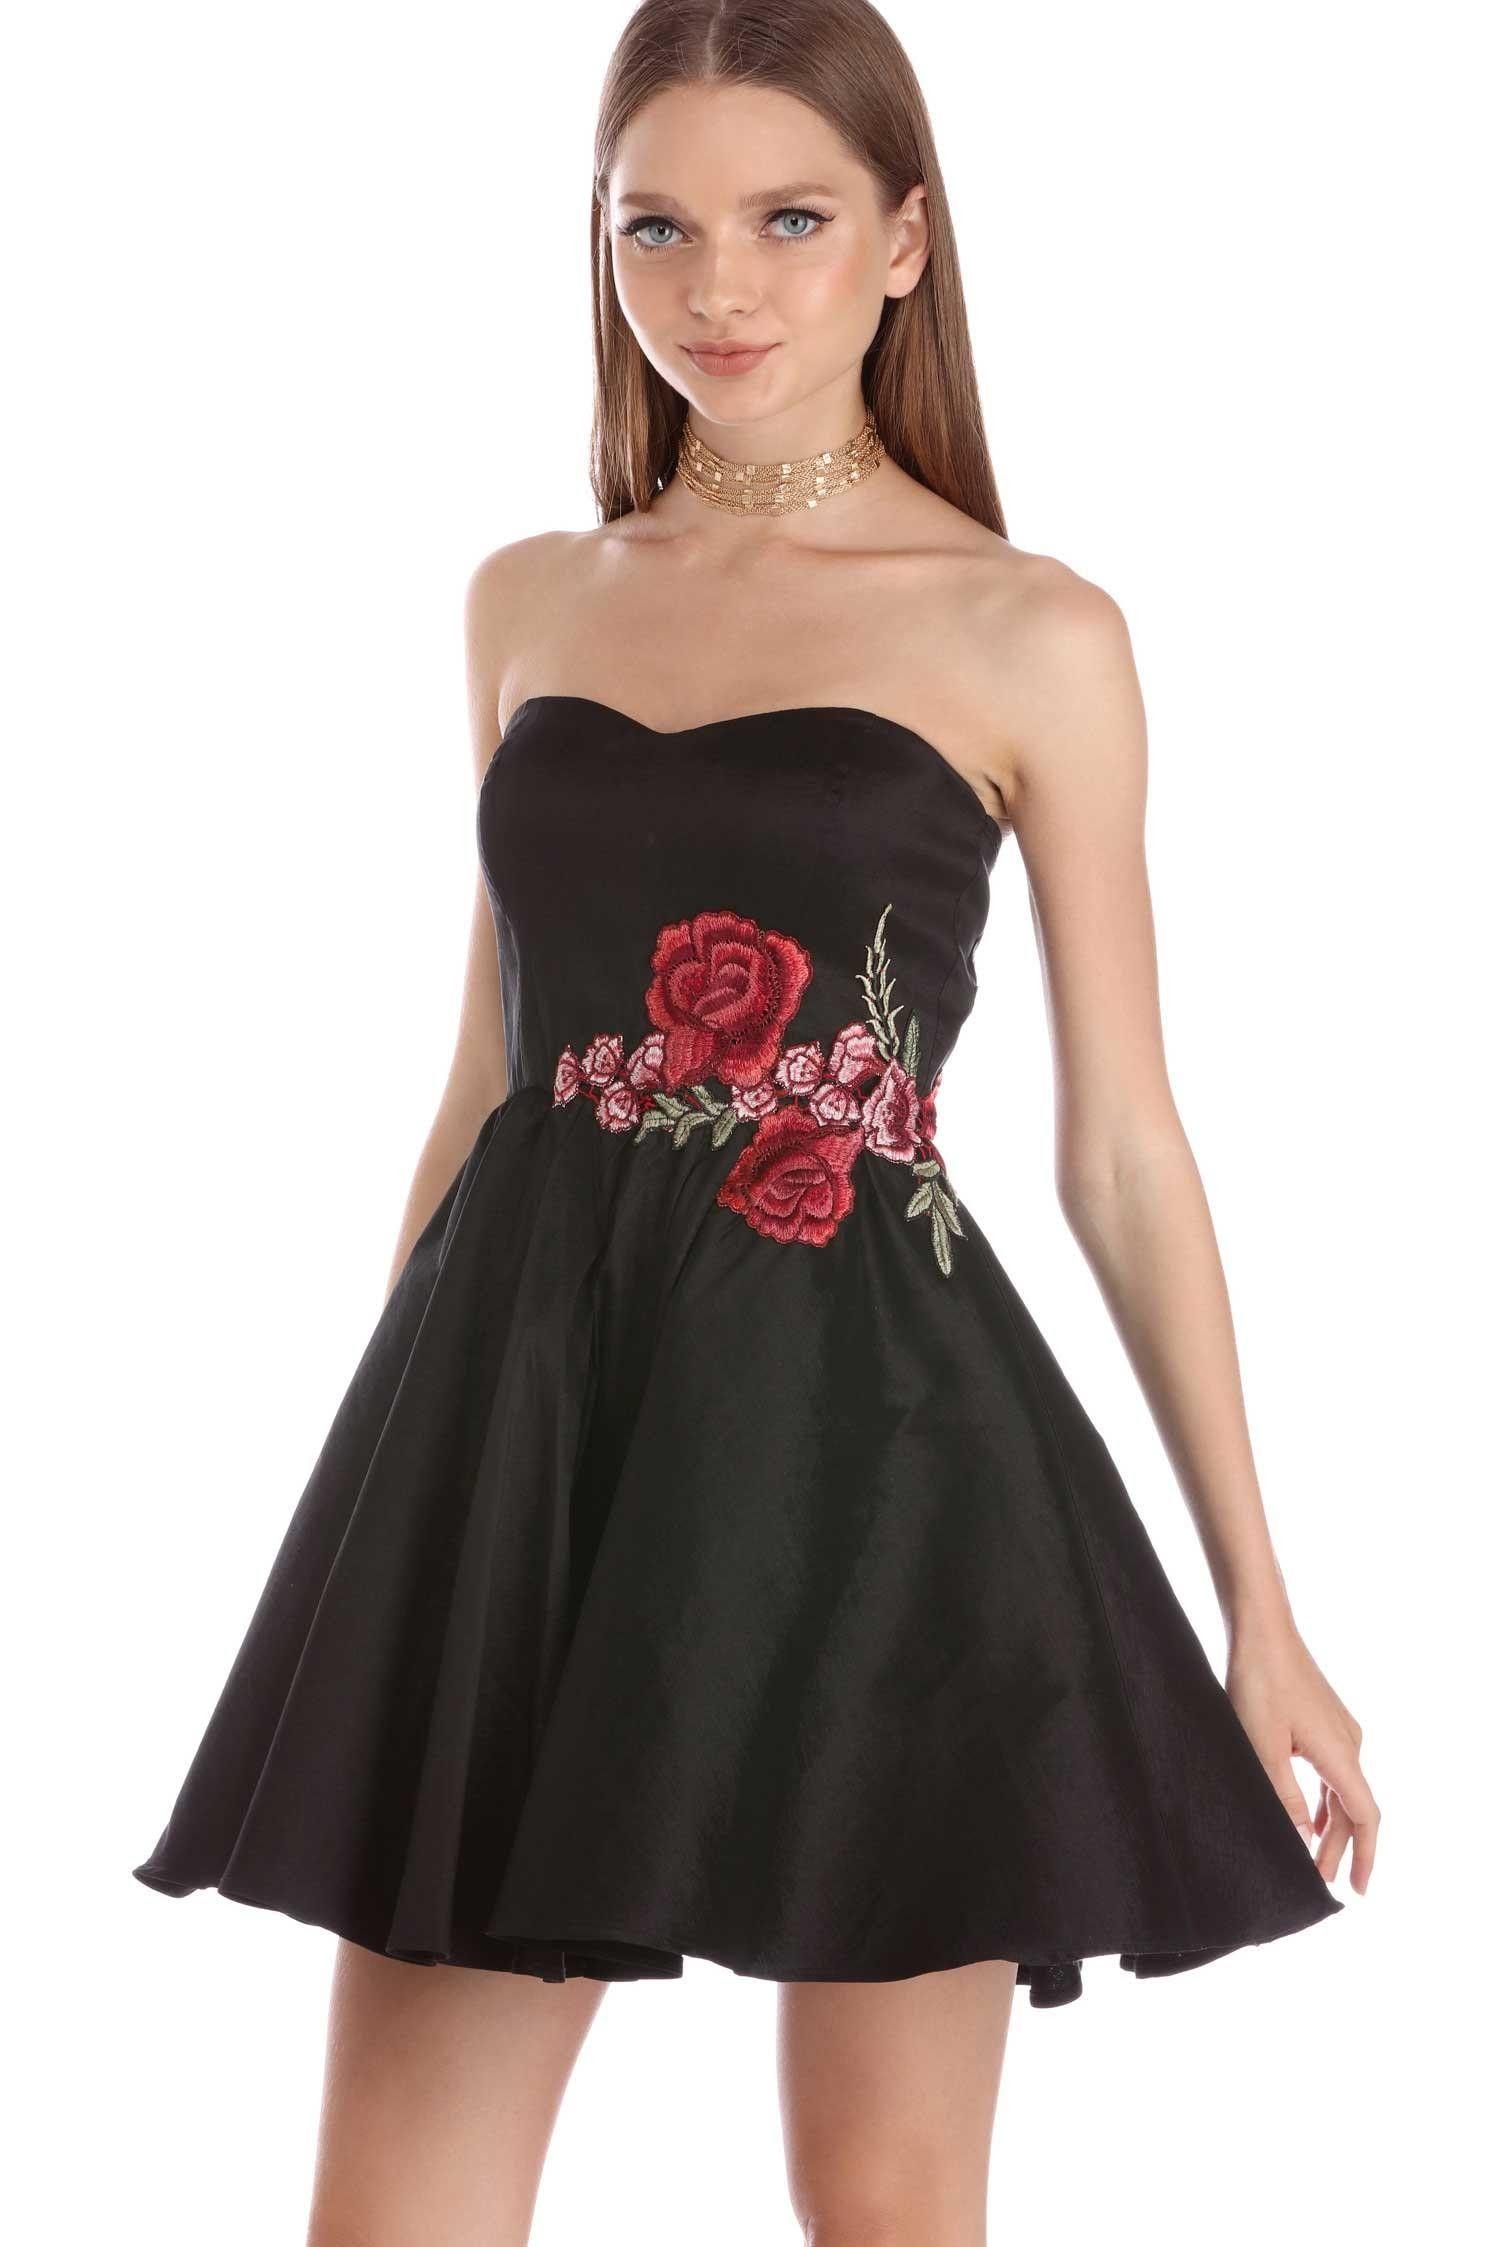 Dianne Black Rose Applique Skater Dress With Images Dresses Fashion Hoco Dresses [ 2247 x 1500 Pixel ]